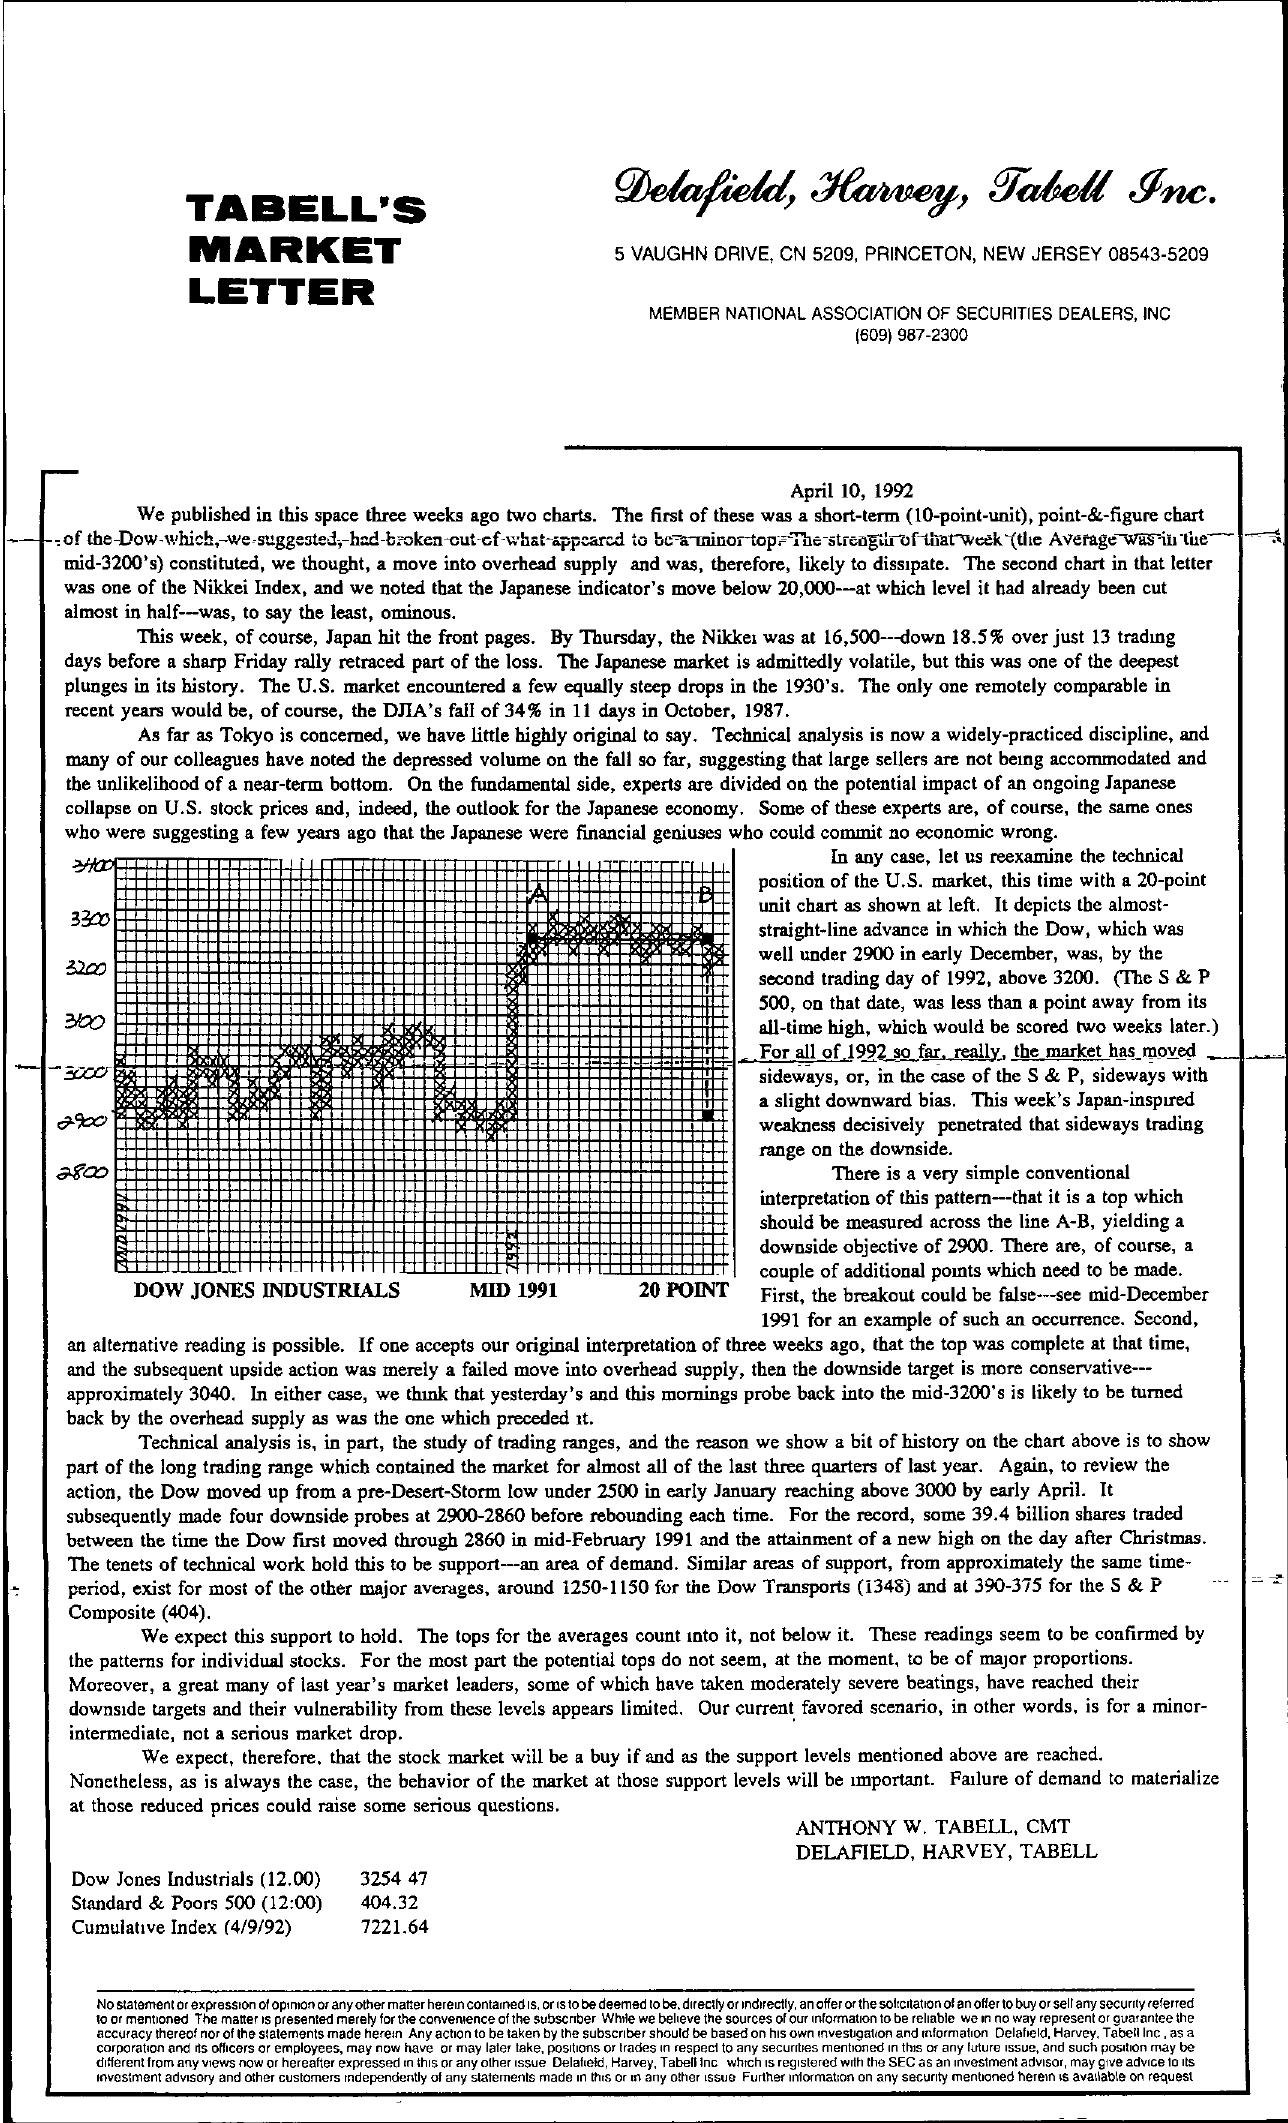 Tabell's Market Letter - April 10, 1992